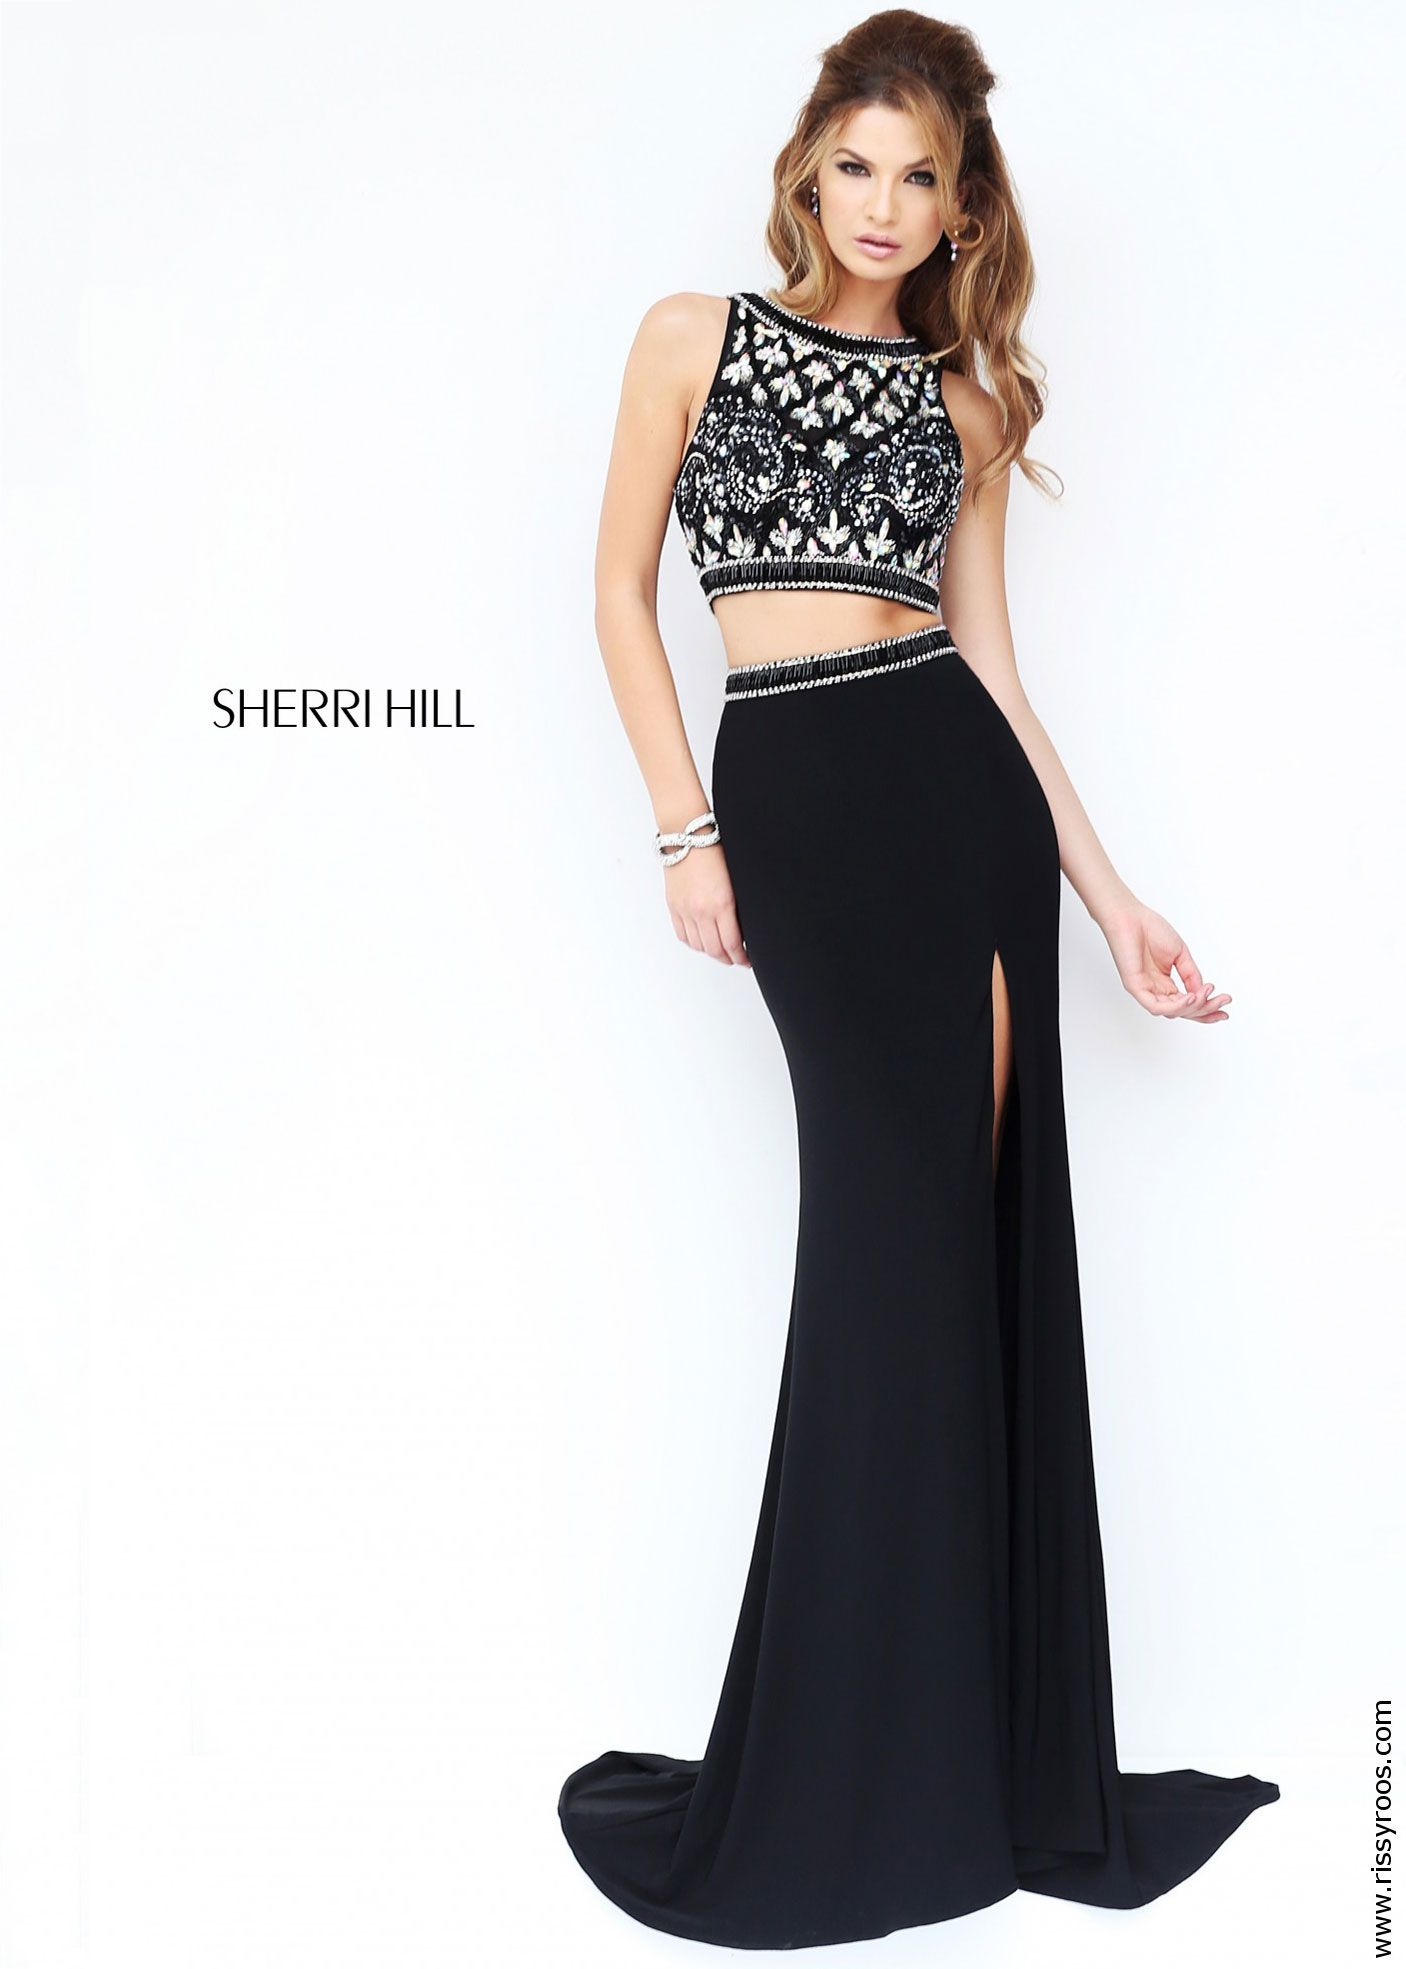 Sherri Hill 9731 Sexy 2-Piece Gown